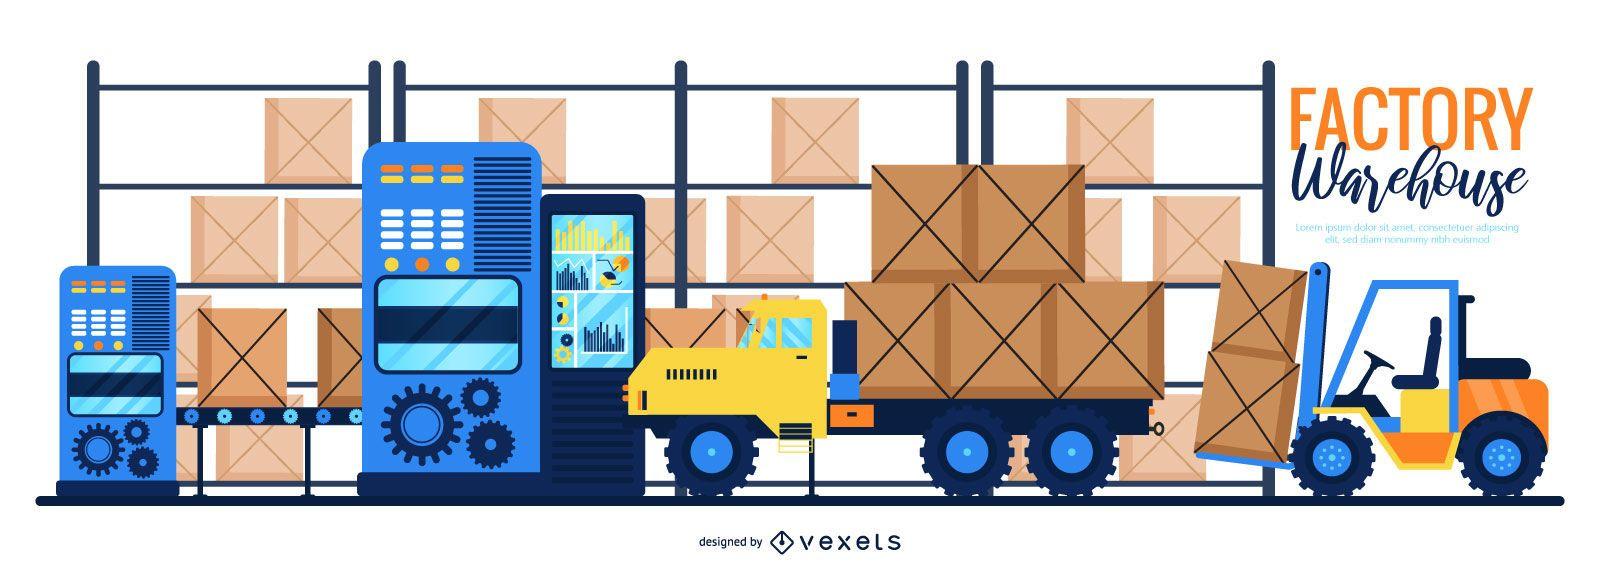 Factory Warehouse Digital Illustration